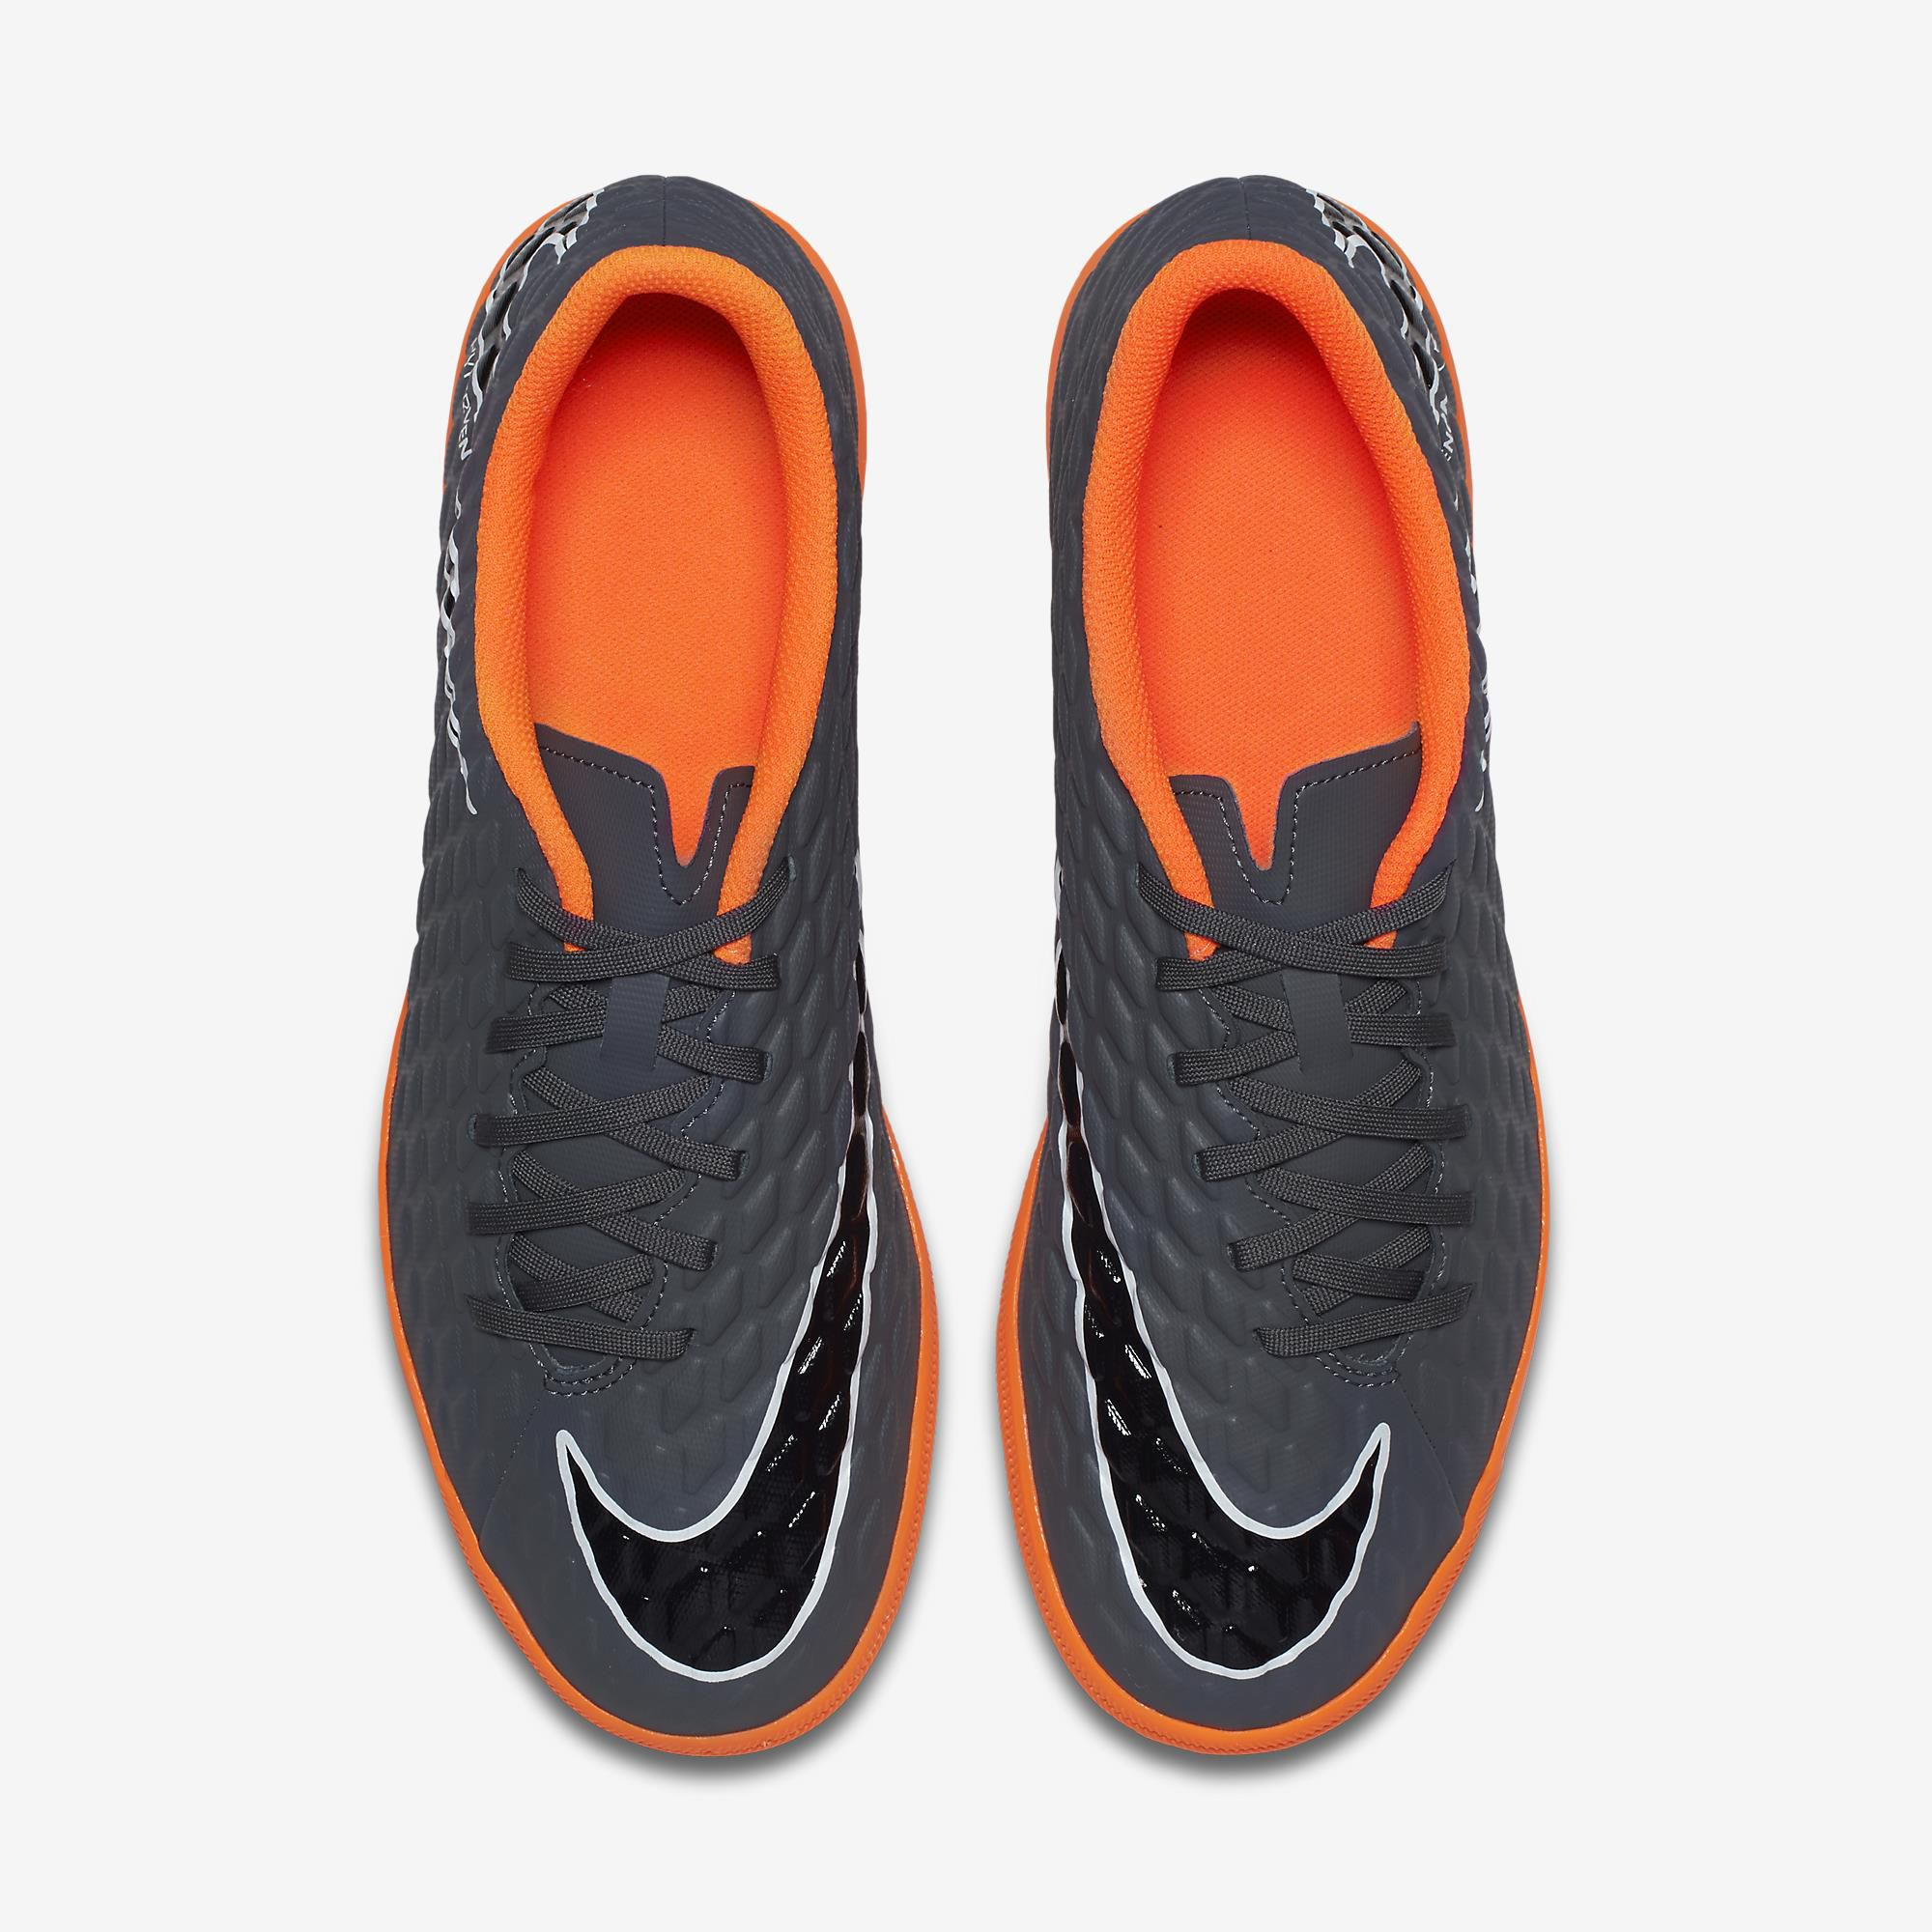 bddc11473d798 Chuteira Nike Hypervenom Phantomx 3 Cl Futsal - BRACIA SHOP  Loja de ...